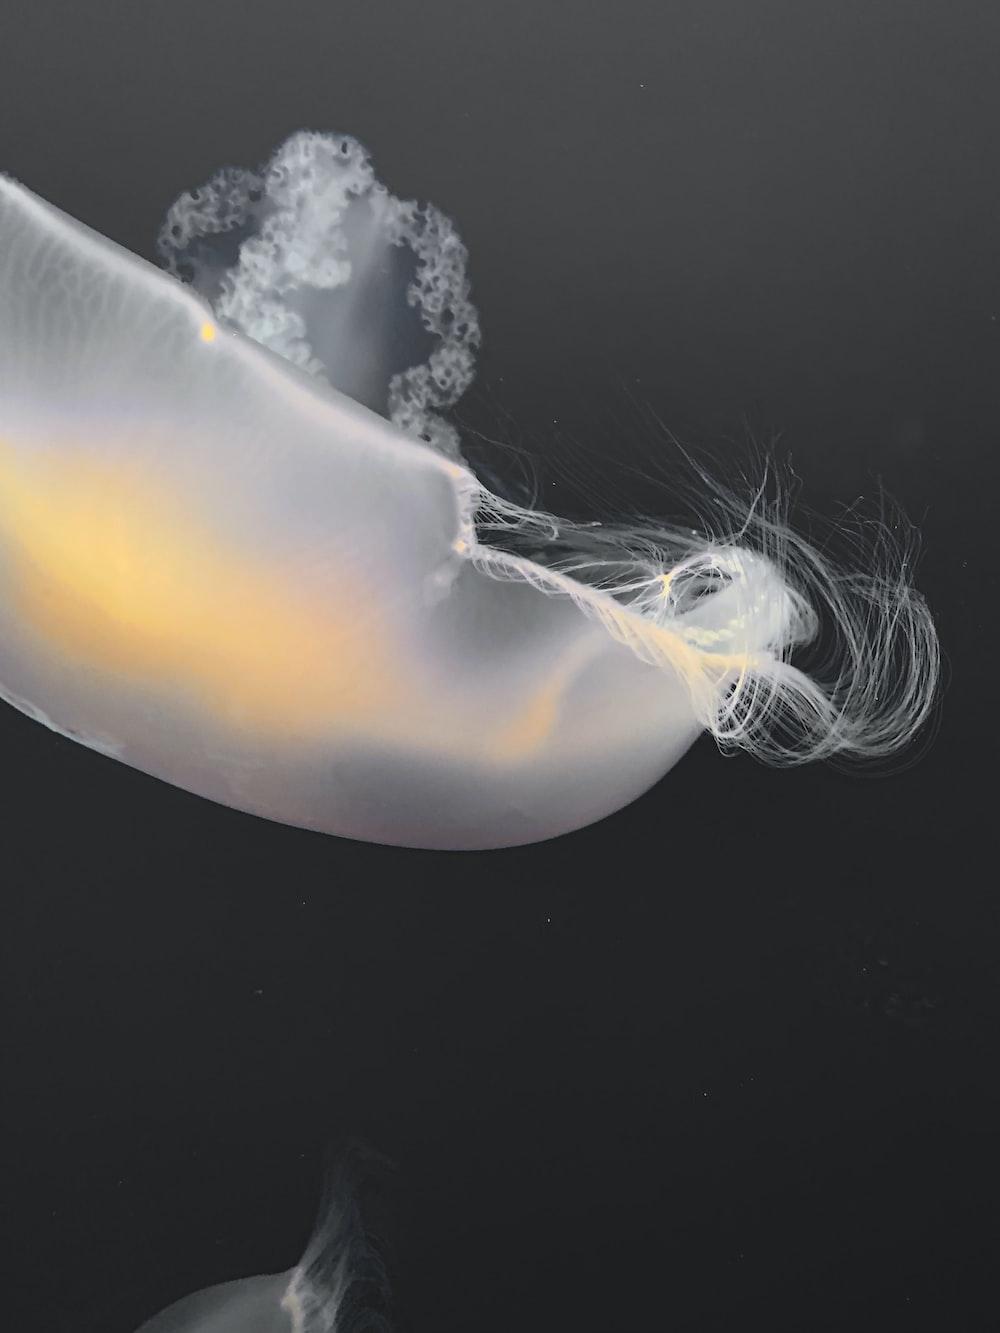 white jelly fish